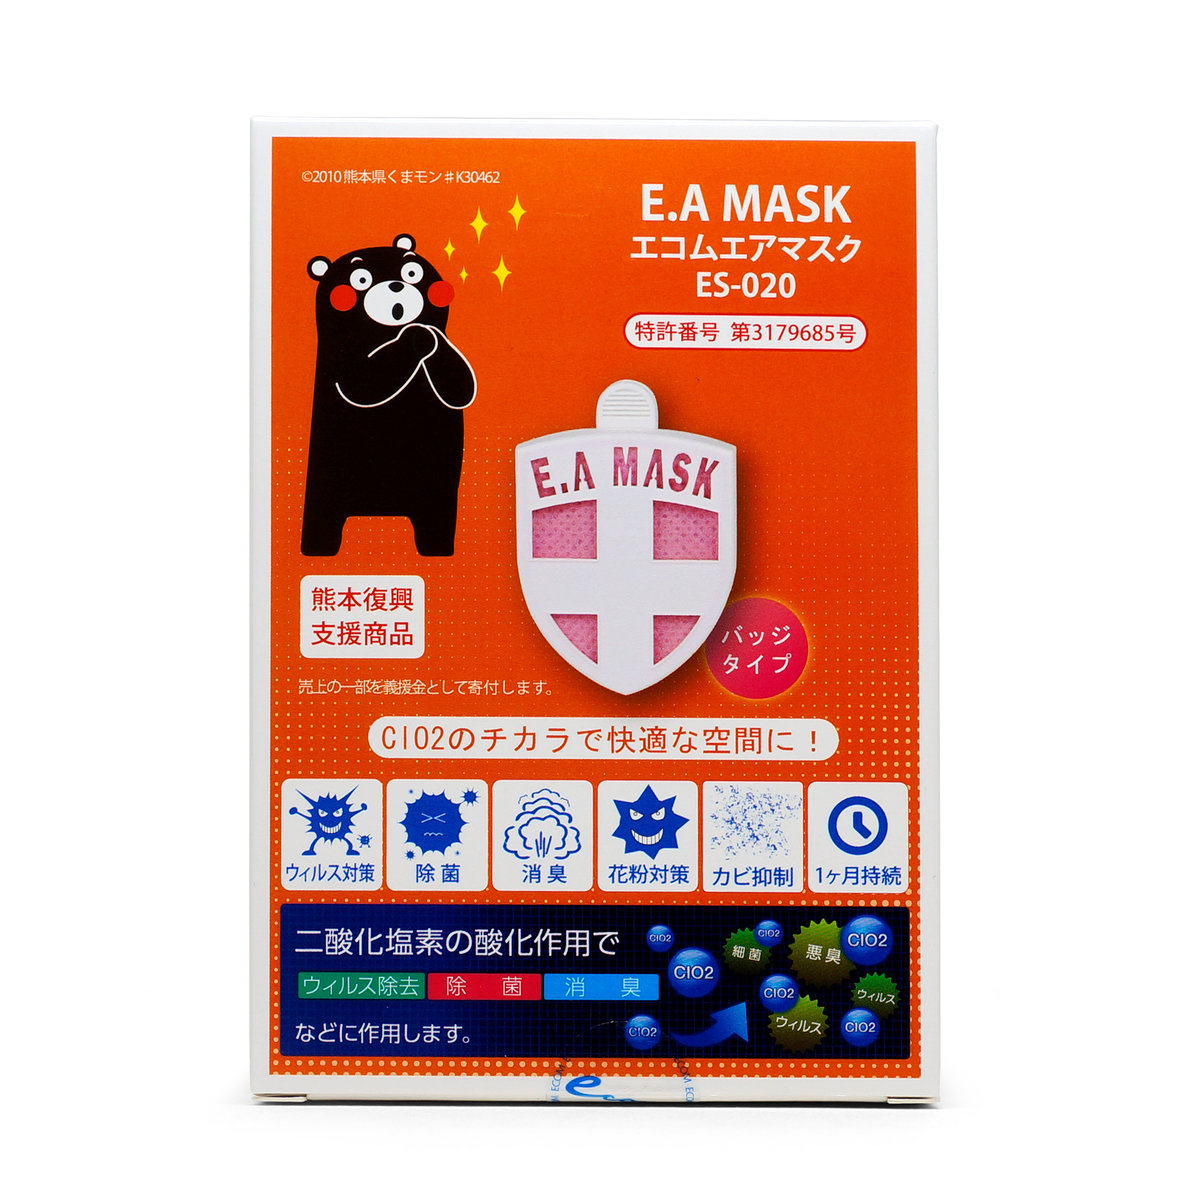 E.A Mask Air Mask Anti-Bacteria & Virus Badge Clip (4907211129222)